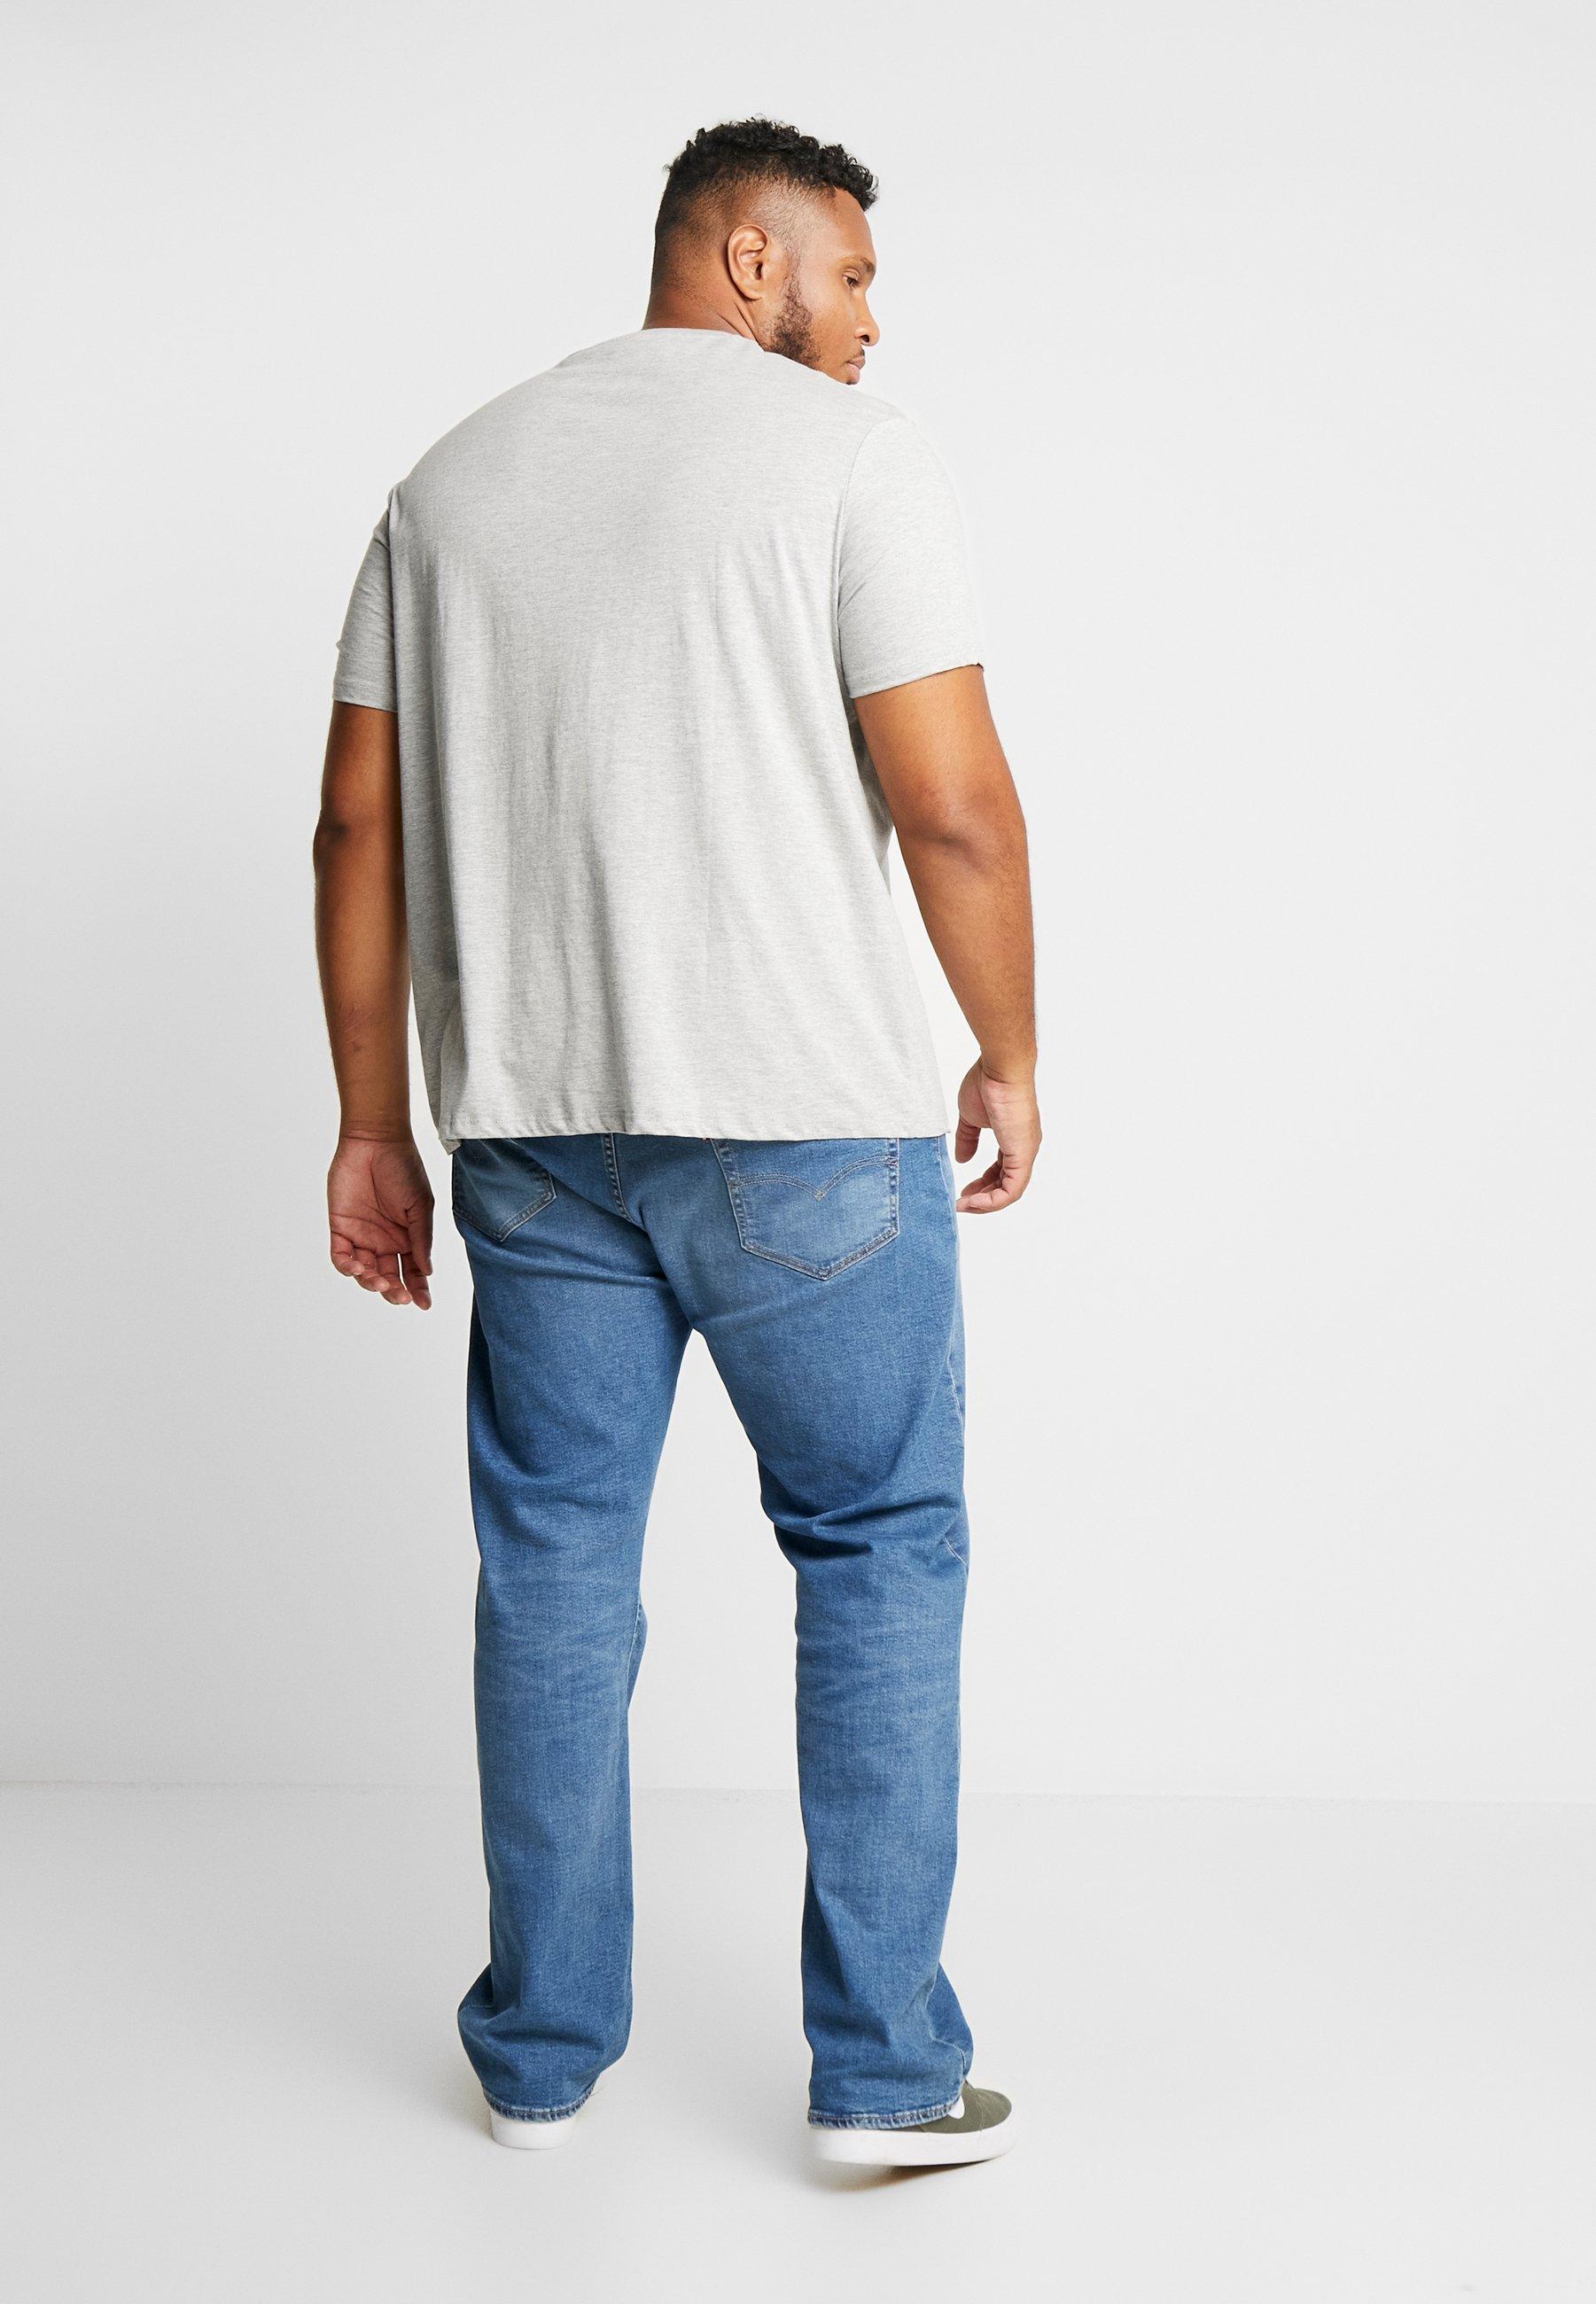 white London PACKT B Menswear grey black amp;T BASIC Burton basic CREW 3 Shirt CxrdQBWoe